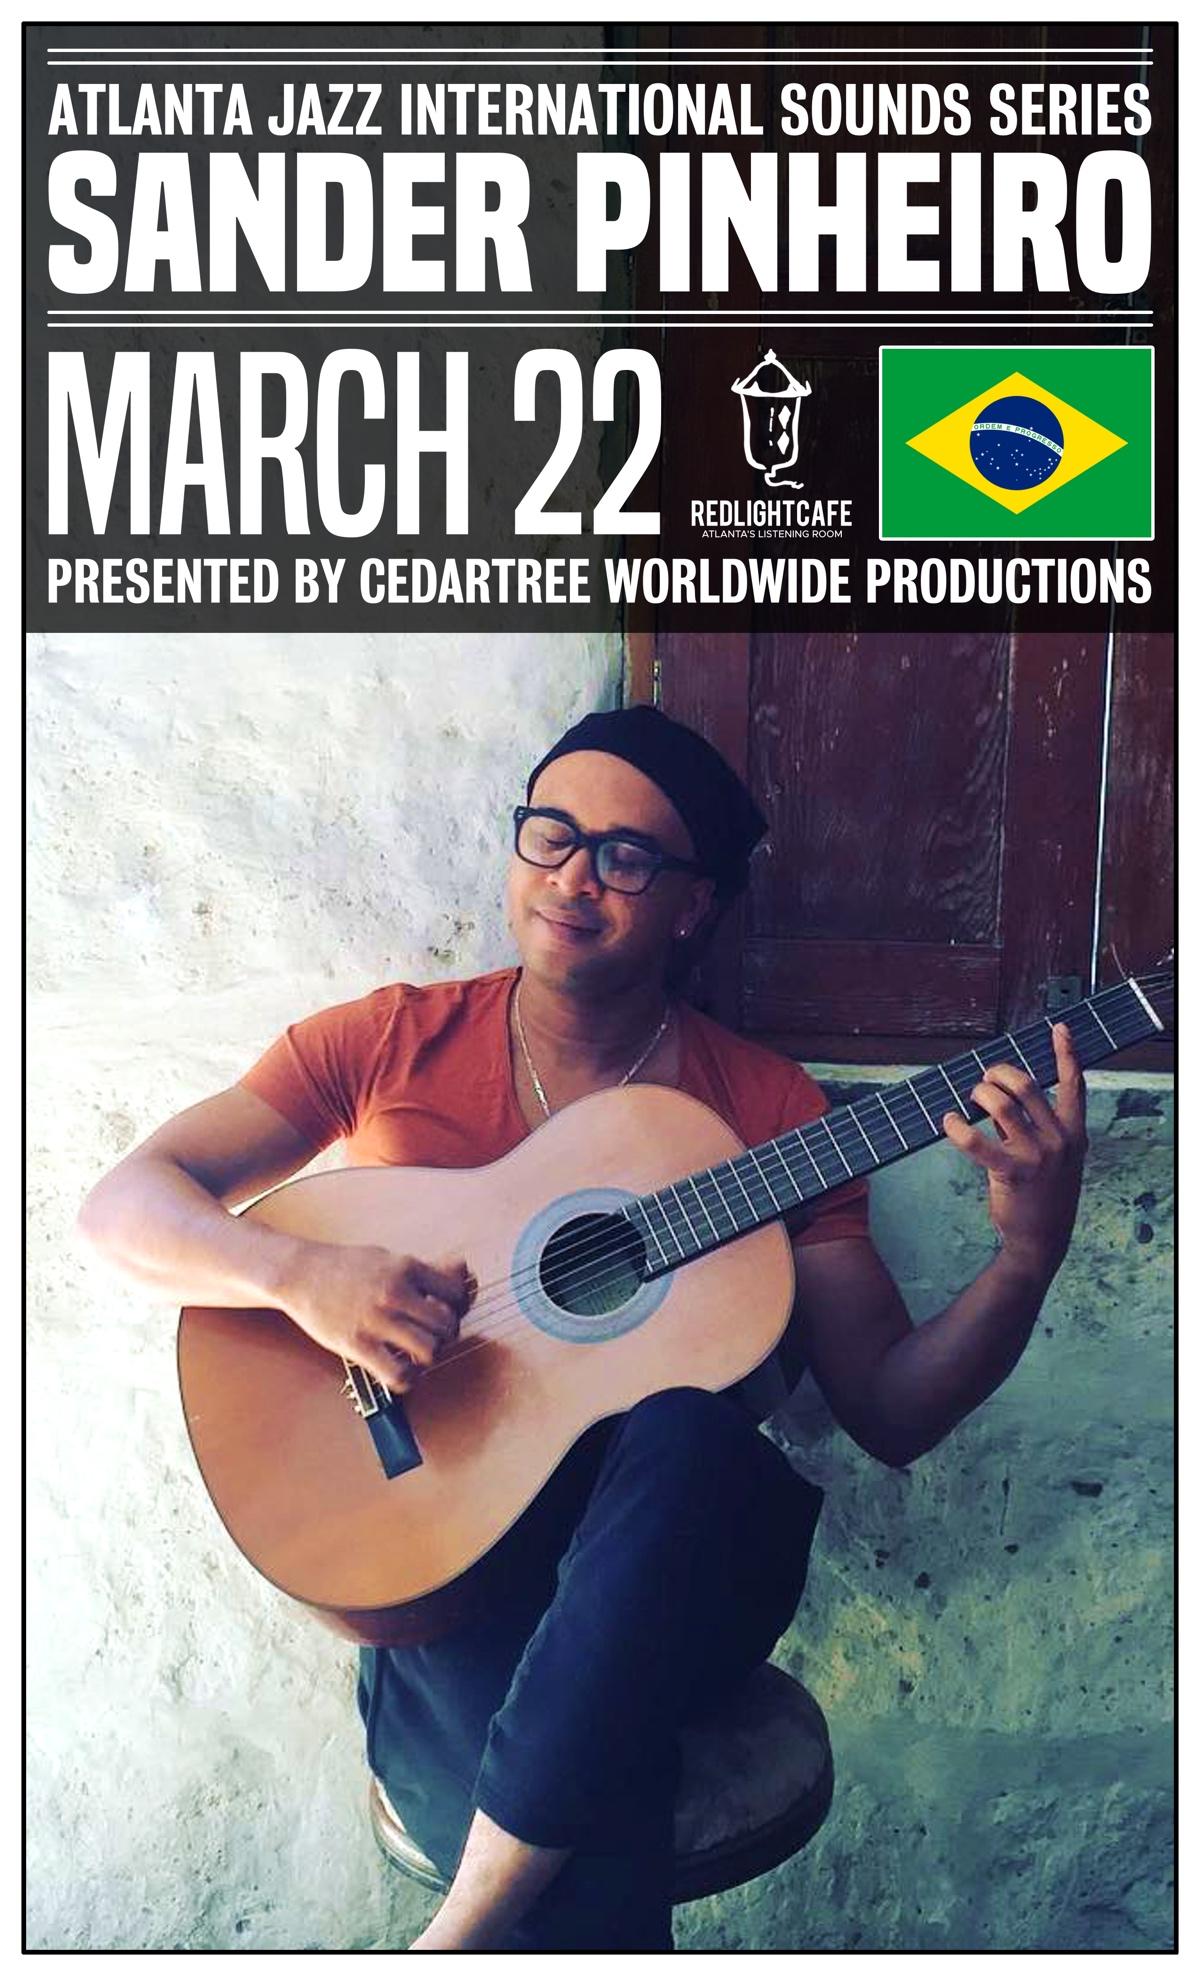 Atlanta Jazz International Sounds Series: Sander Pinheiro — March 22, 2019 — Red Light Café, Atlanta, GA